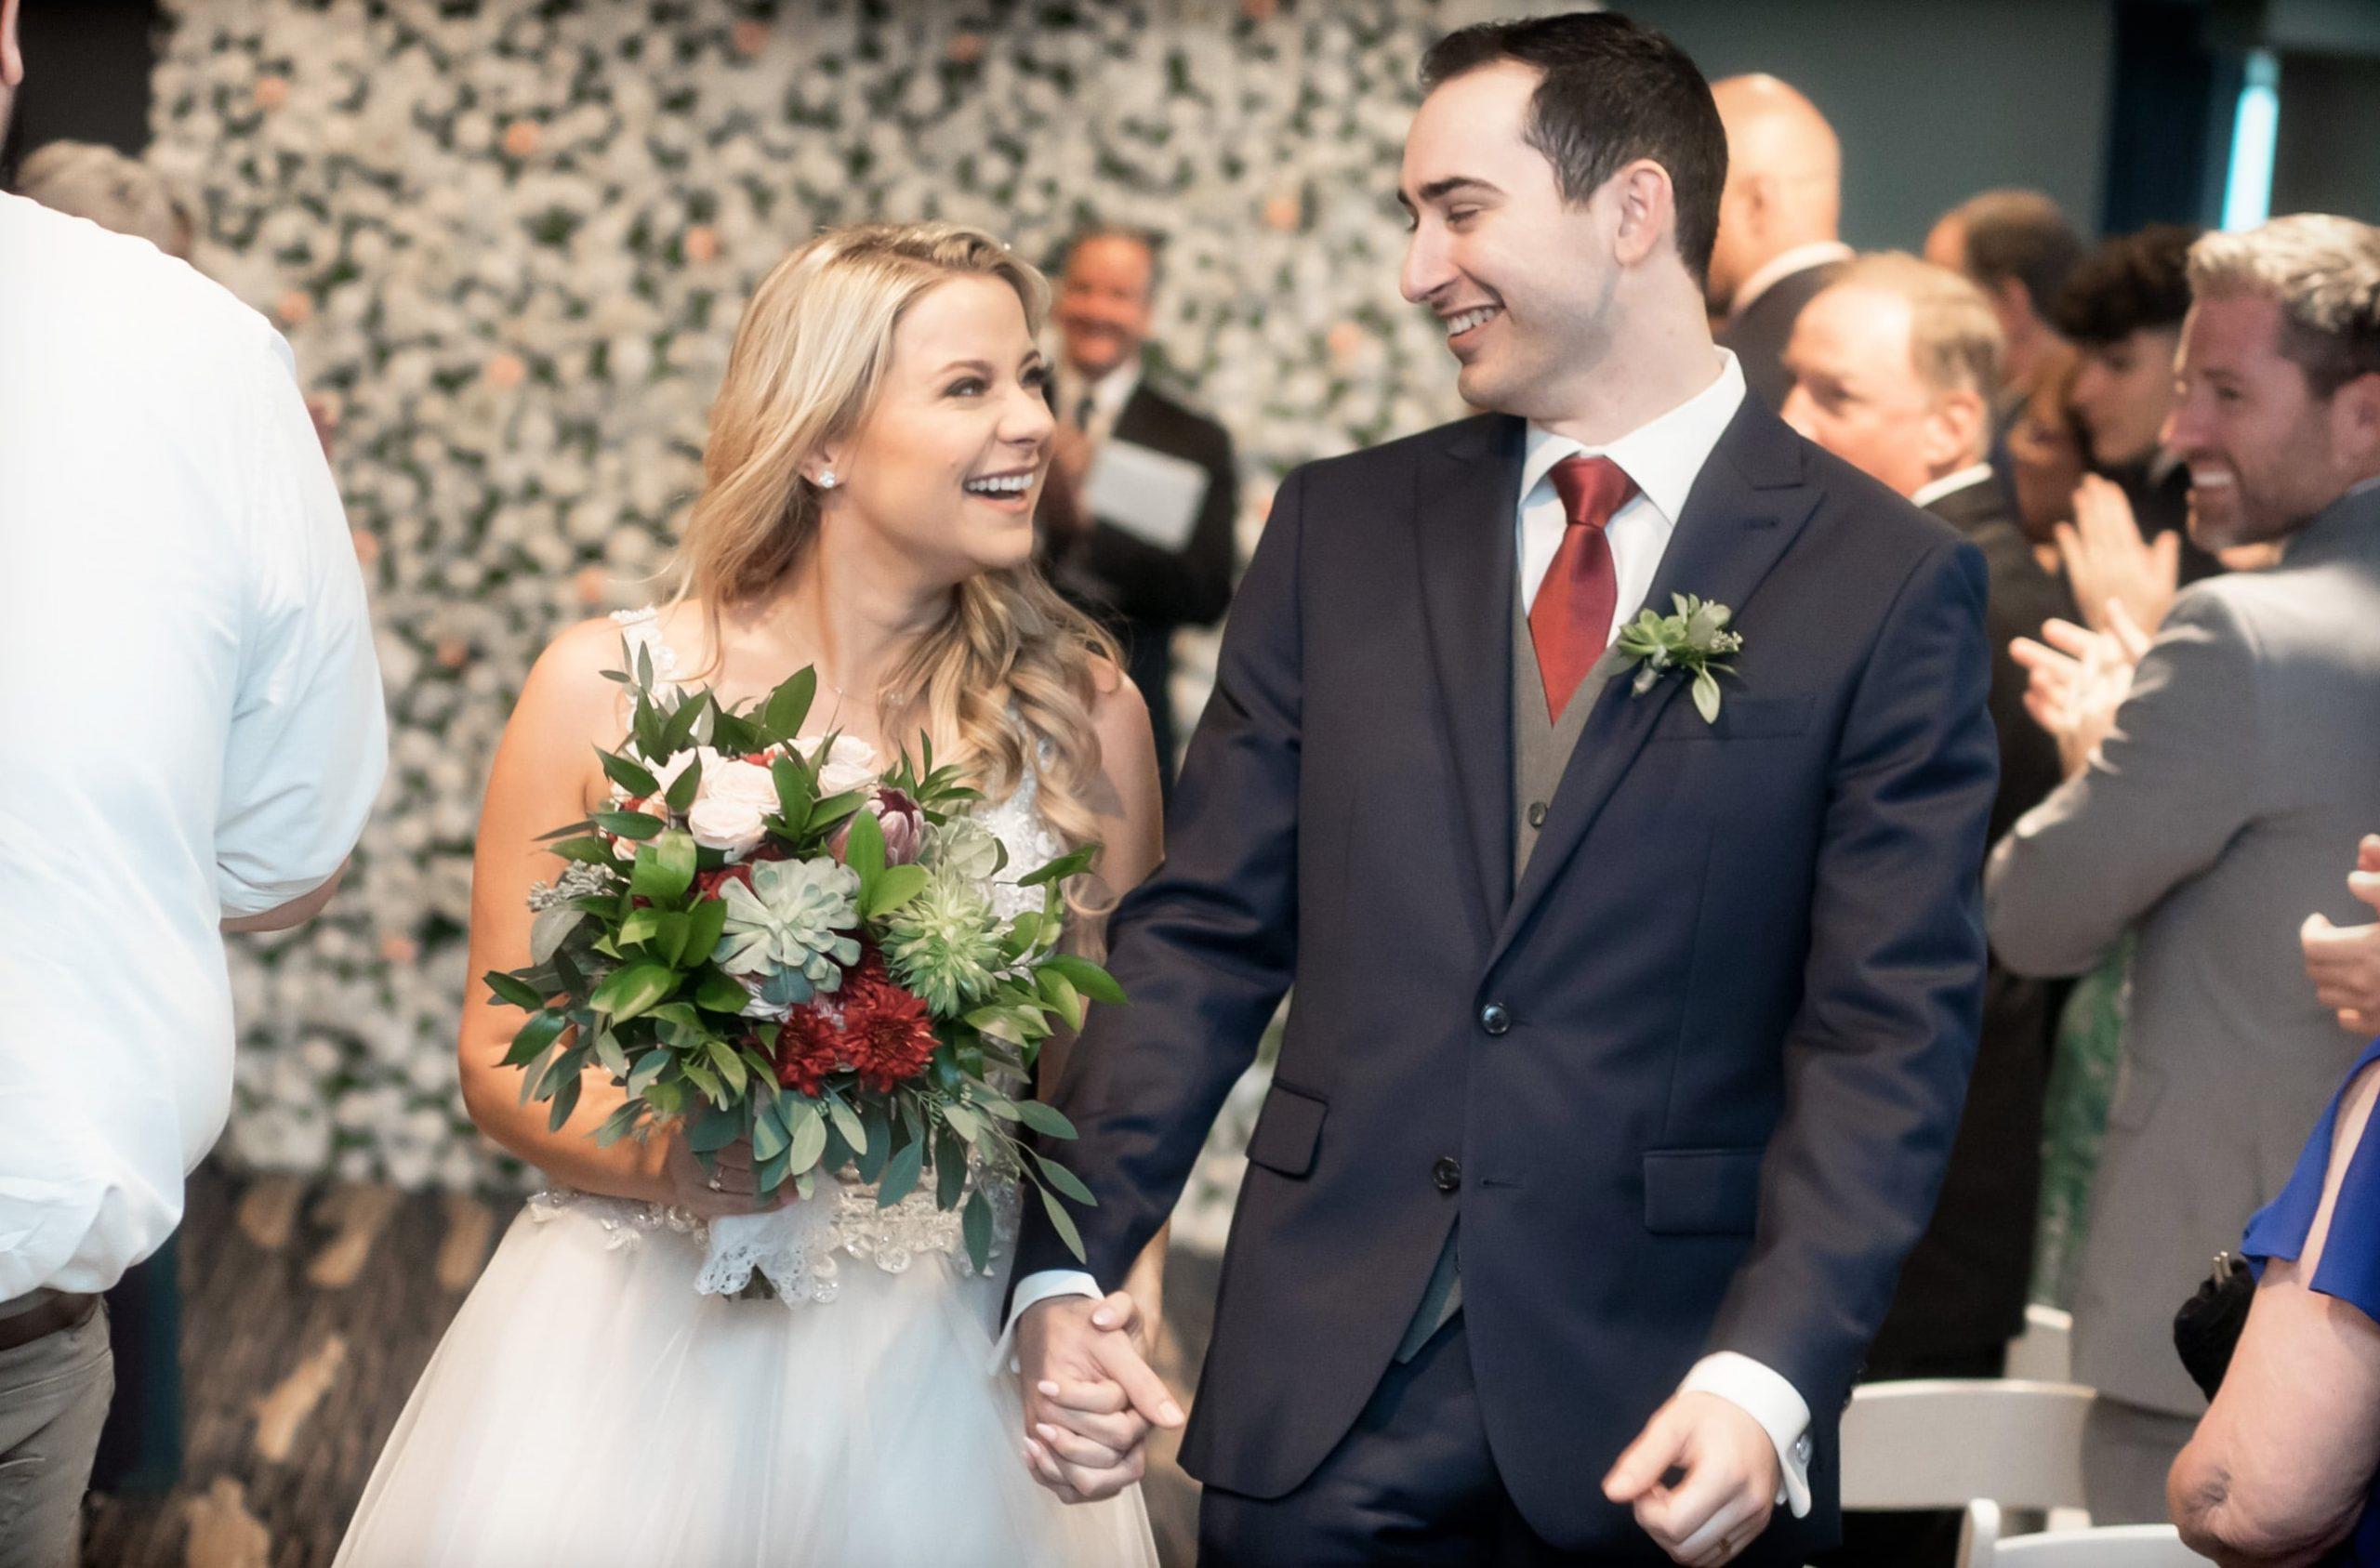 Tampa Wedding, Outdoor Wedding, Tampa Floral, Grand Hyatt, Grand Hyatt Tampa Bay, Tampa Event, Tampa Decor, Armanis, Armanis Wedding